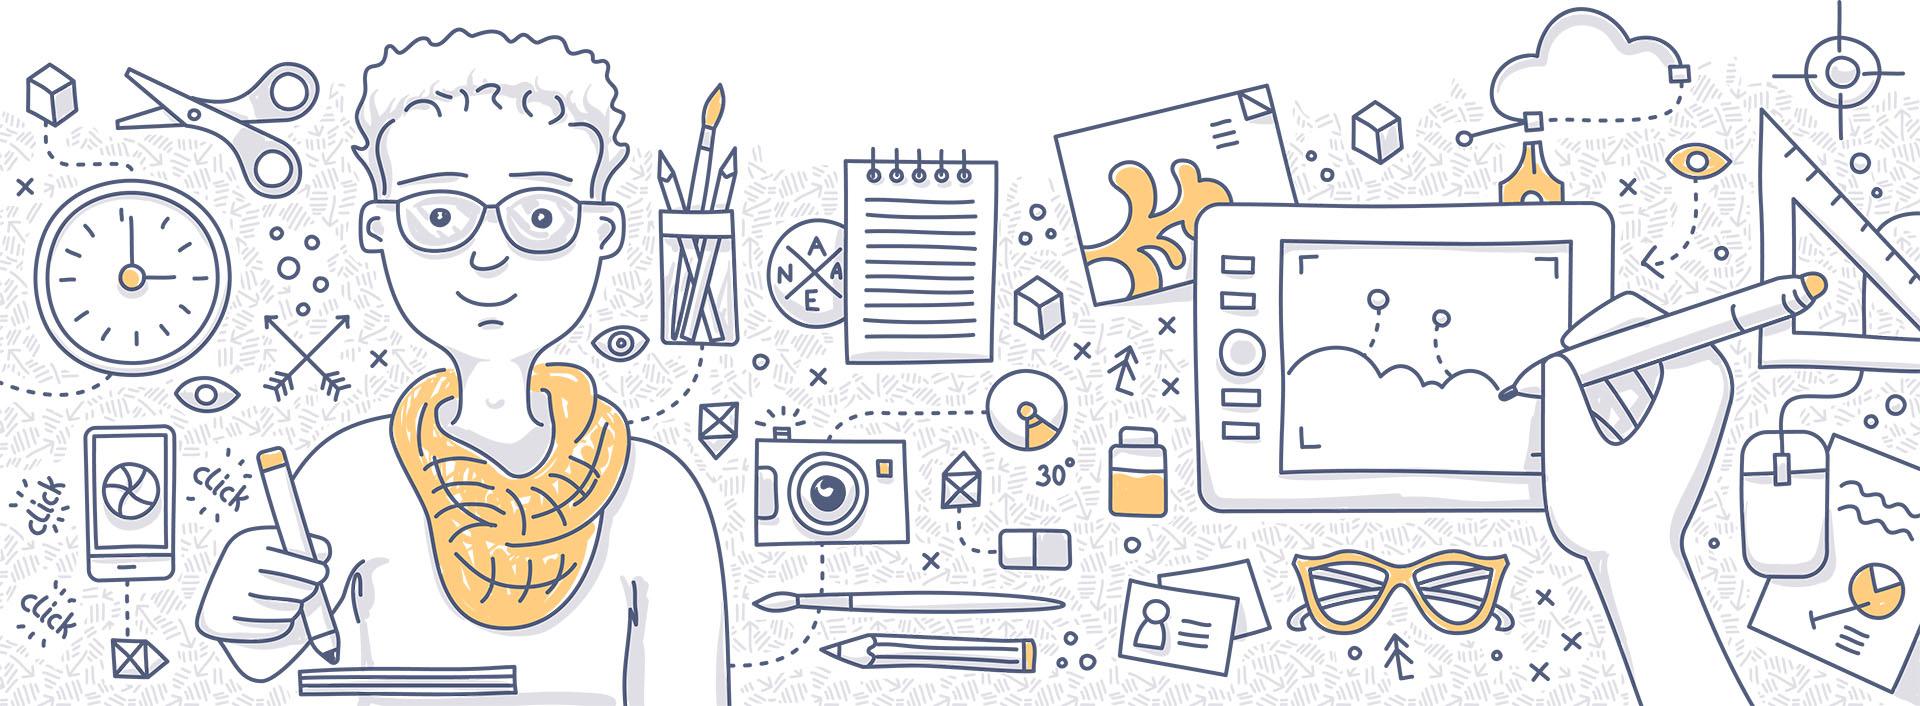 The Best Digital Agency, The Best Digital Agency UK, Digital Marketing, Digital Marketing UK, Digital Strategy, Digital Strategy UK, Social Media Management, Social Media Management UK, Social Media Strategy, Social Media Strategy UK, Social Media, Social Media UK, Content Creation, Content Creation UK, Content Curation, Content Curation UK, Content Management, Content Management UK, SEO, SEO UK, SEO Local, SEO Local UK, Local SEO, Local SEO UK, Search Engine Optimisation, Search Engine Optimisation UK, Local Search Engine Optimisation, Local Search Engine Optimisation UK, Search Engine Optimization, Search Engine Optimization UK, Local Search Engine Optimization, Local Search Engine Optimization UK, Local Search, Local Search Optimisation UK, Mobile Search Optimisation, Mobile Search Optimisation UK, WordPress Website Design, WordPress Website Design UK, WordPress Web Design, WordPress Web Design UK, Website Design, Website Design UK, Design Services, Design Services UK, Brand Strategy, Brand Strategy UK, Brand Identity, Brand Identity UK, eCommerce web design, eCommerce Web design UK, Facebook Ads Design, Facebook Ads Design UK, Google My Business Setup, Google My Business Setup UK, business Consulting, Business Consulting UK